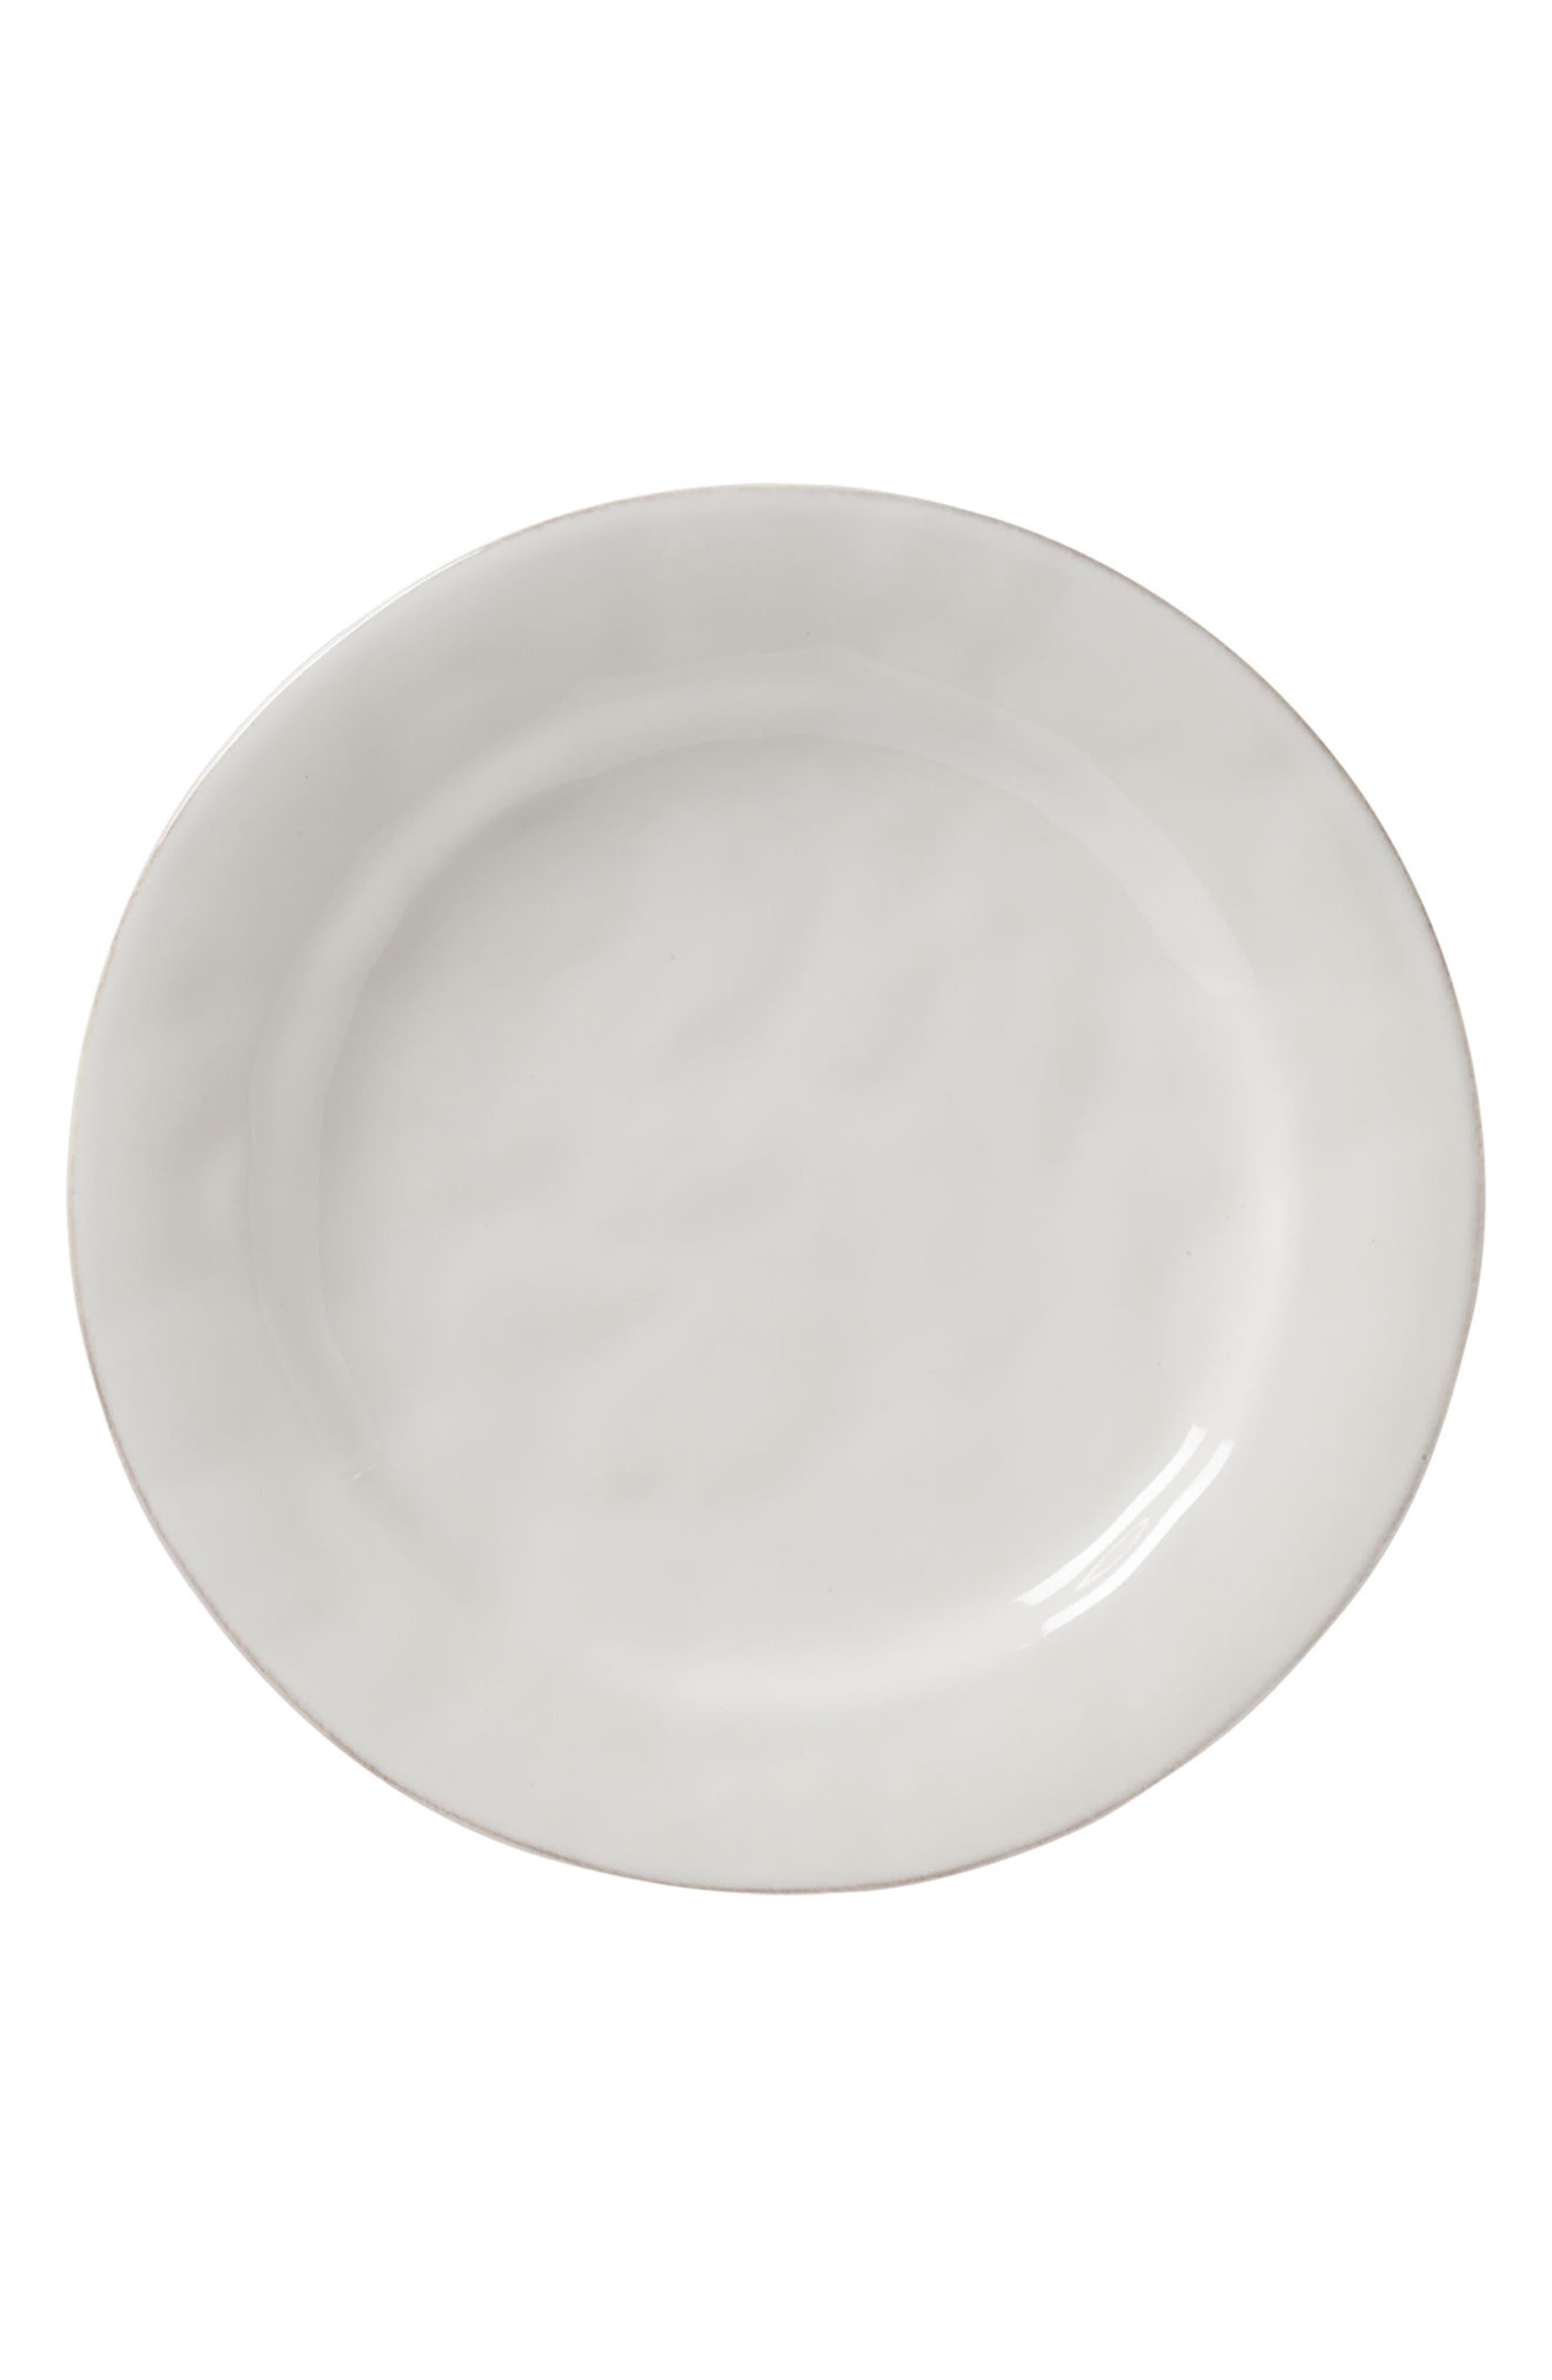 Puro Dinner Plate,                         Main,                         color, Whitewash